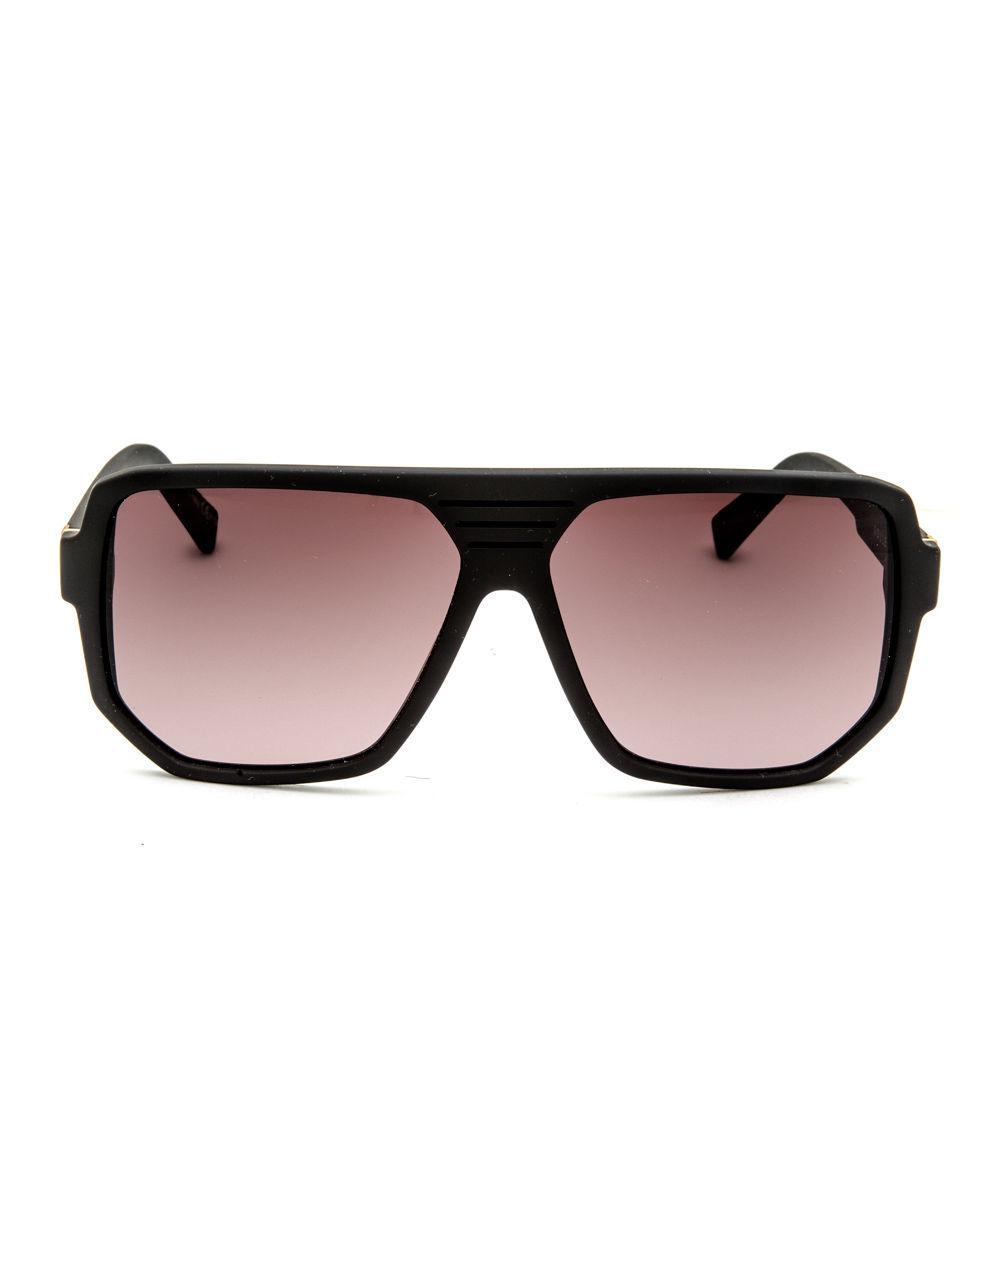 642bdf4510 Lyst - Von Zipper Roller Sunglasses in Black for Men